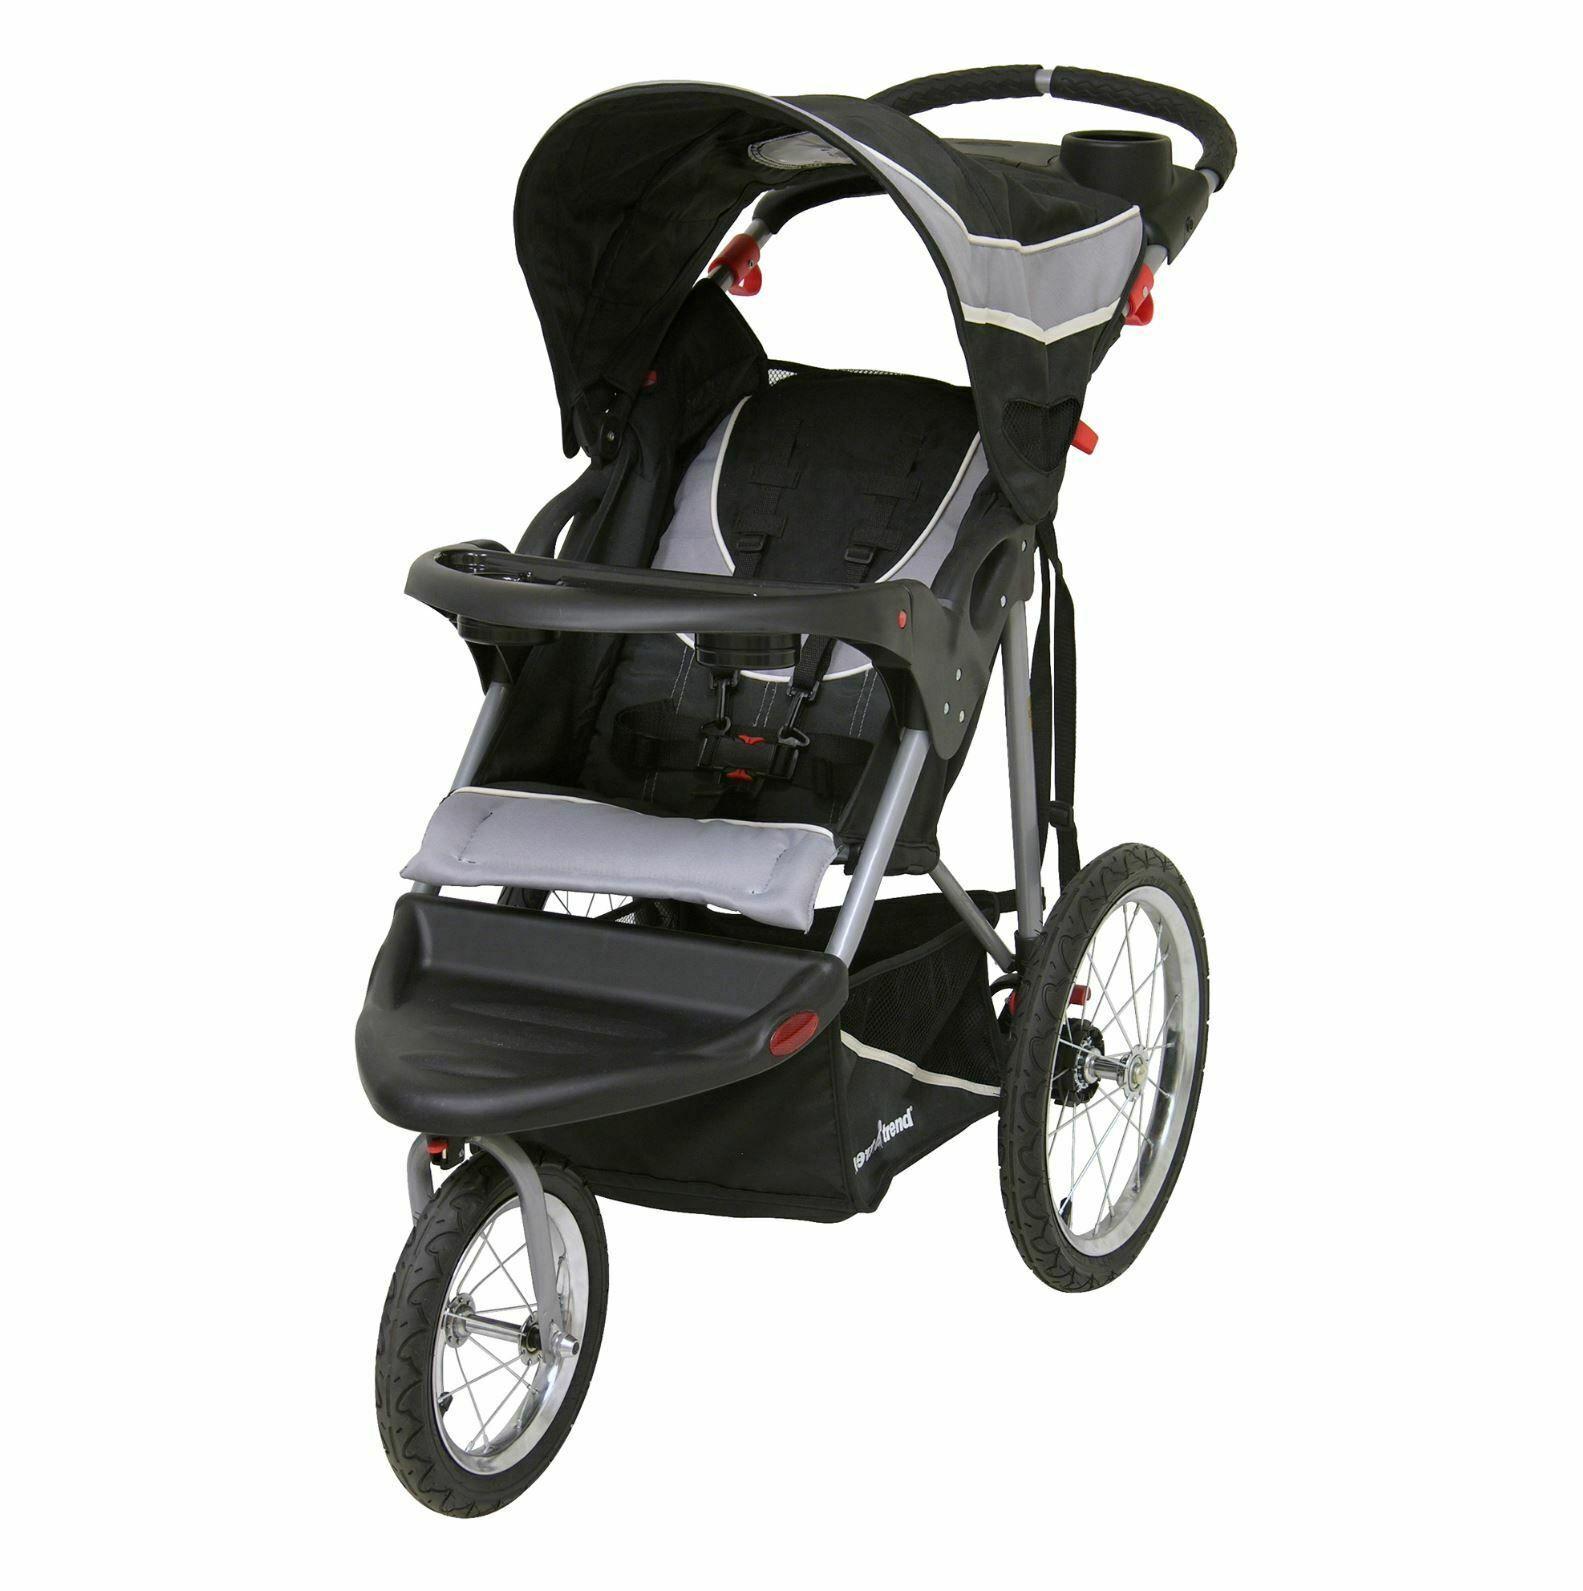 Baby Trend Stroller For Jogging Running All Terrain Tires